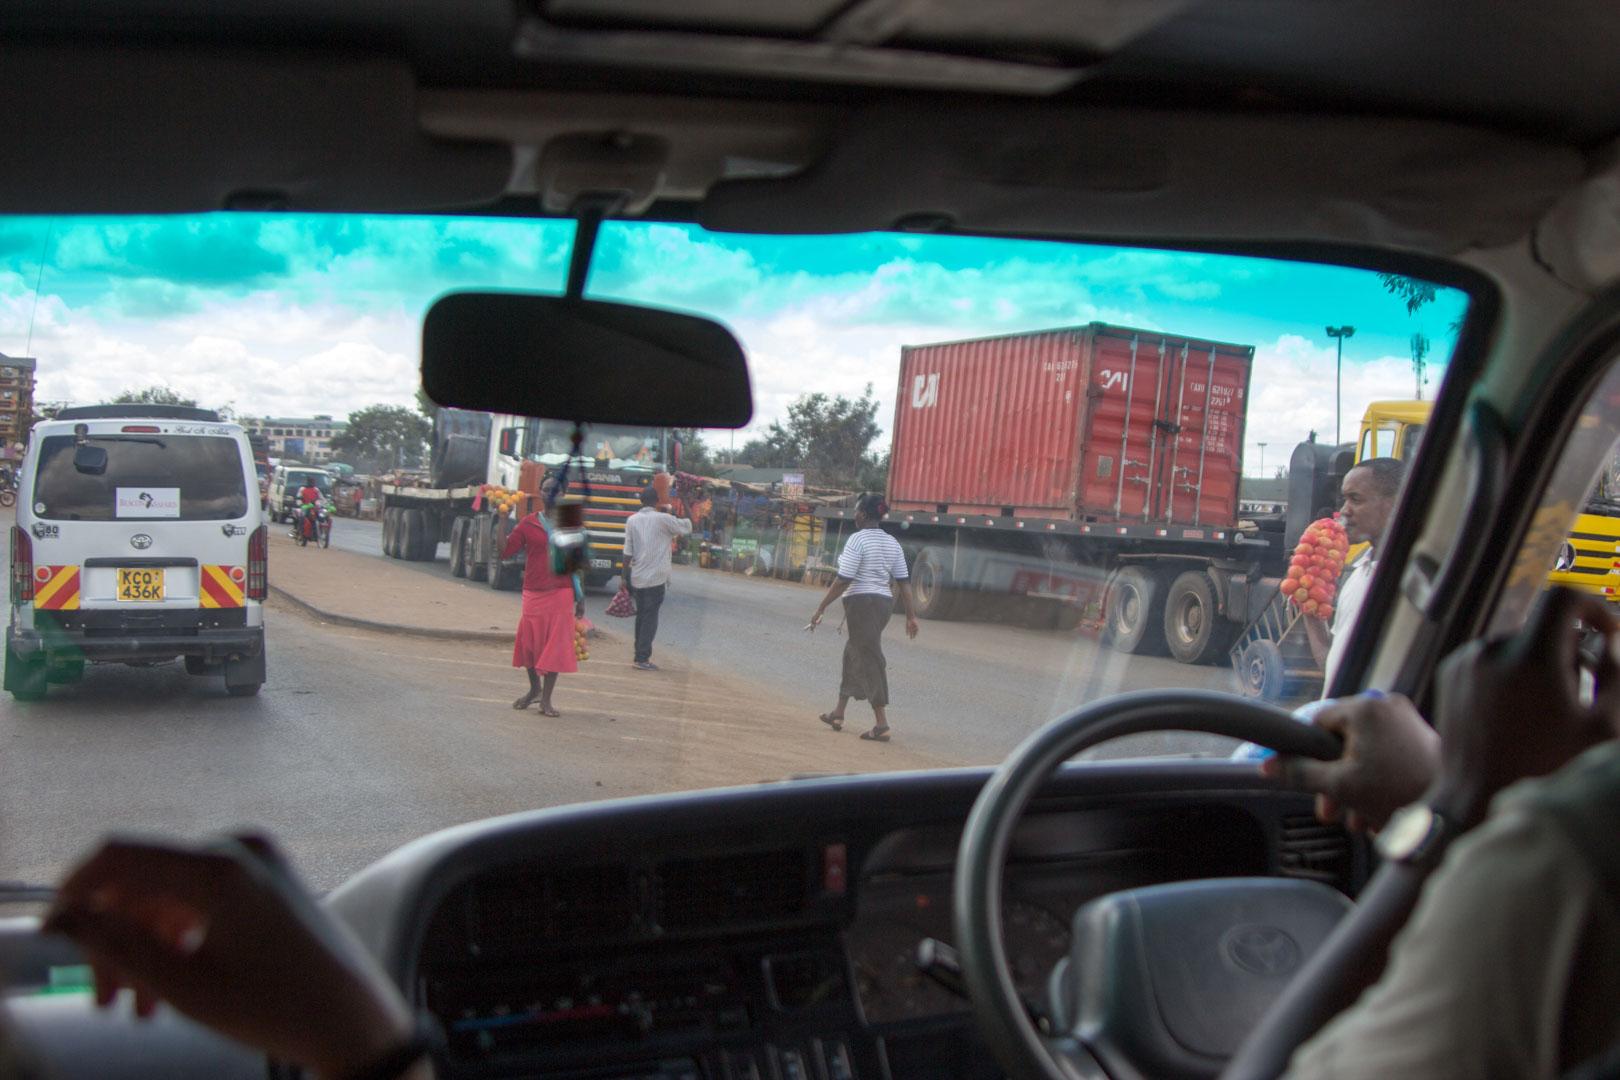 Carretera de Nairobi a Amboseli, Kenia